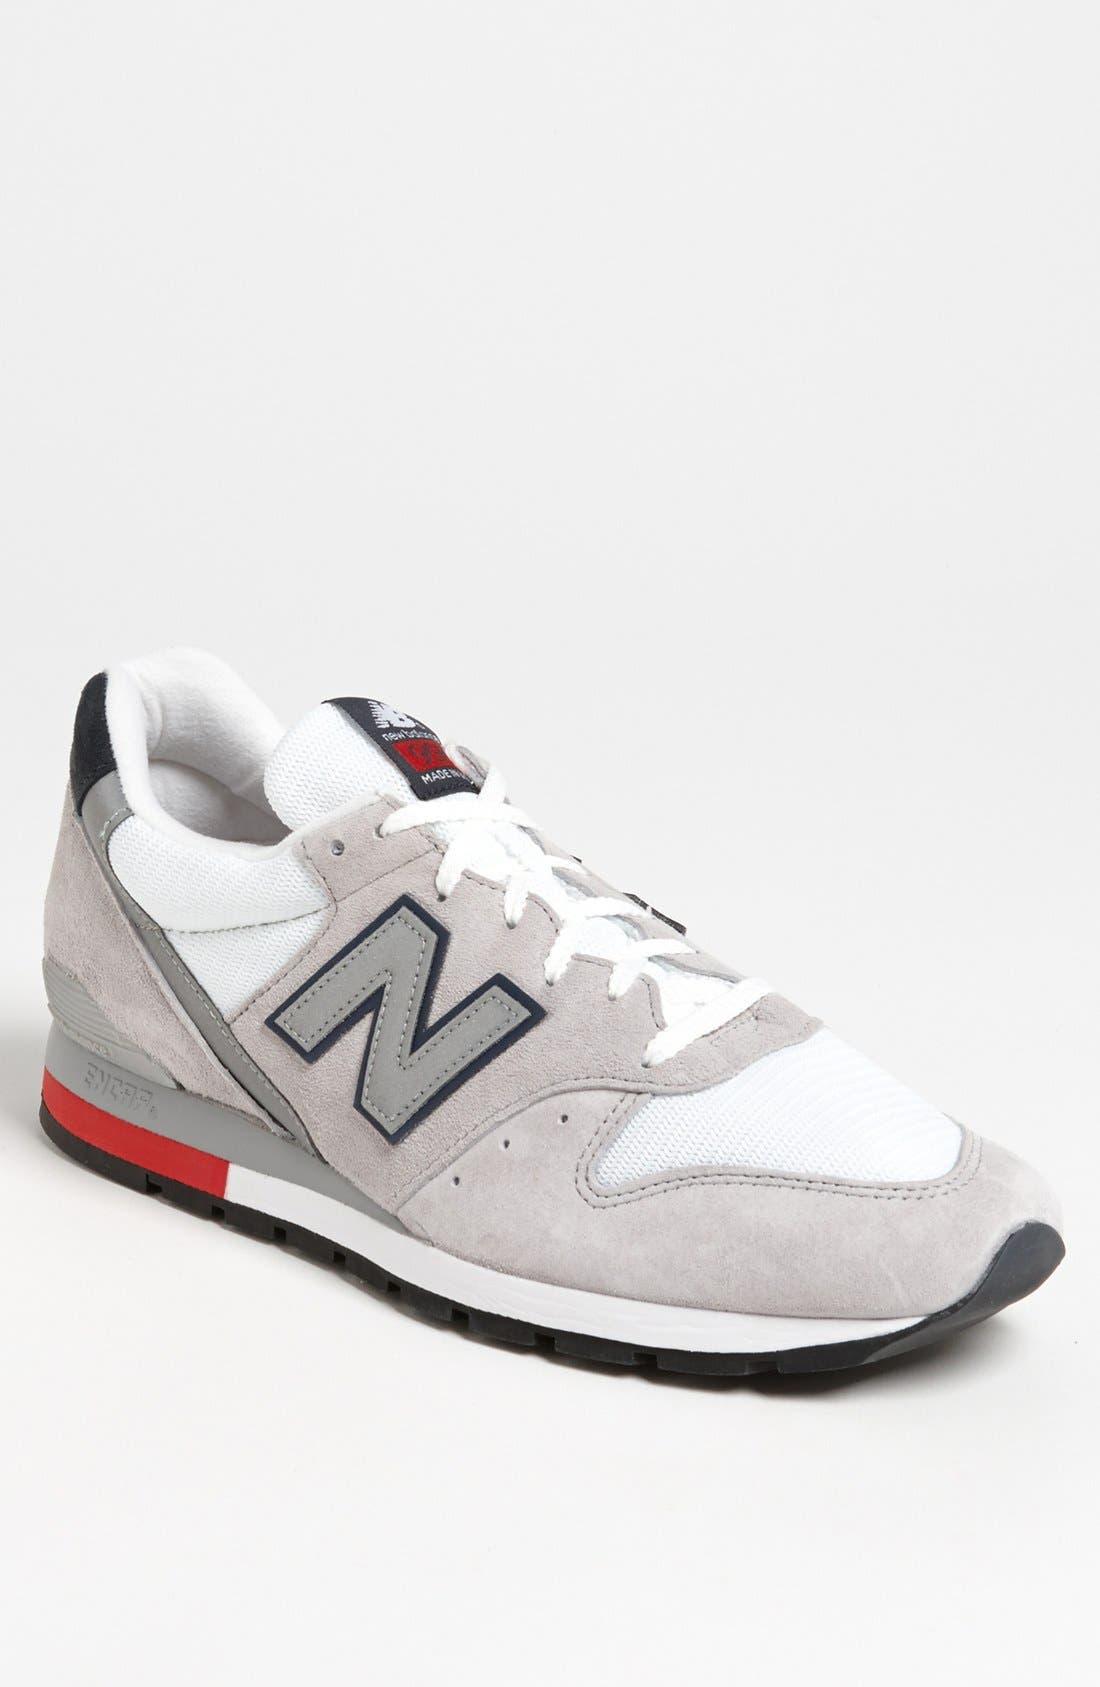 Main Image - New Balance '996 Classic' Sneaker (Men)